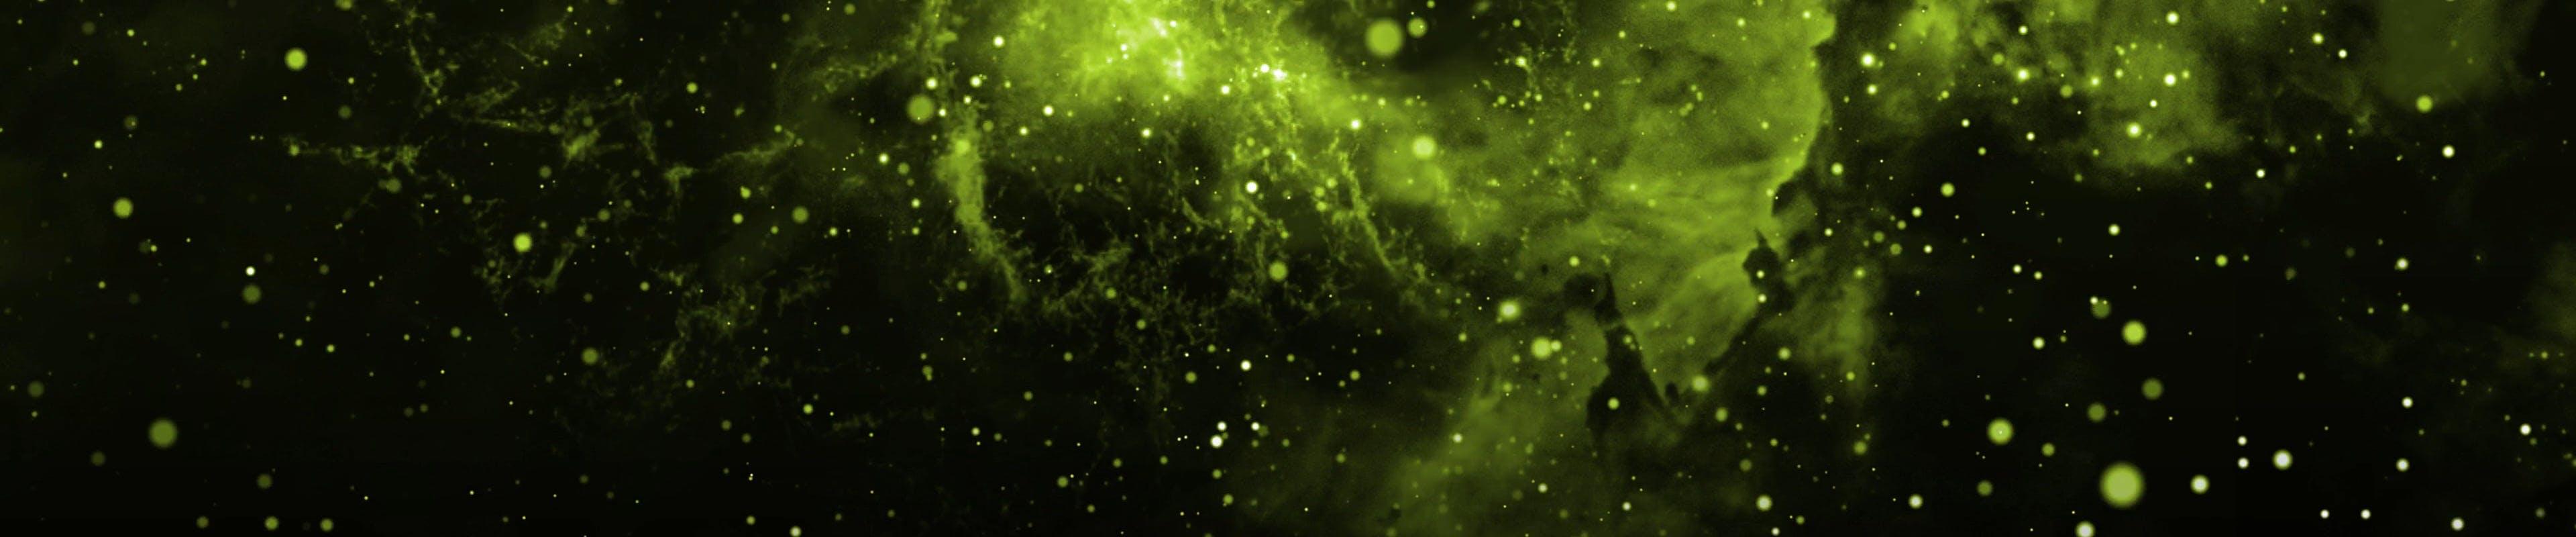 CGI Animation Effects